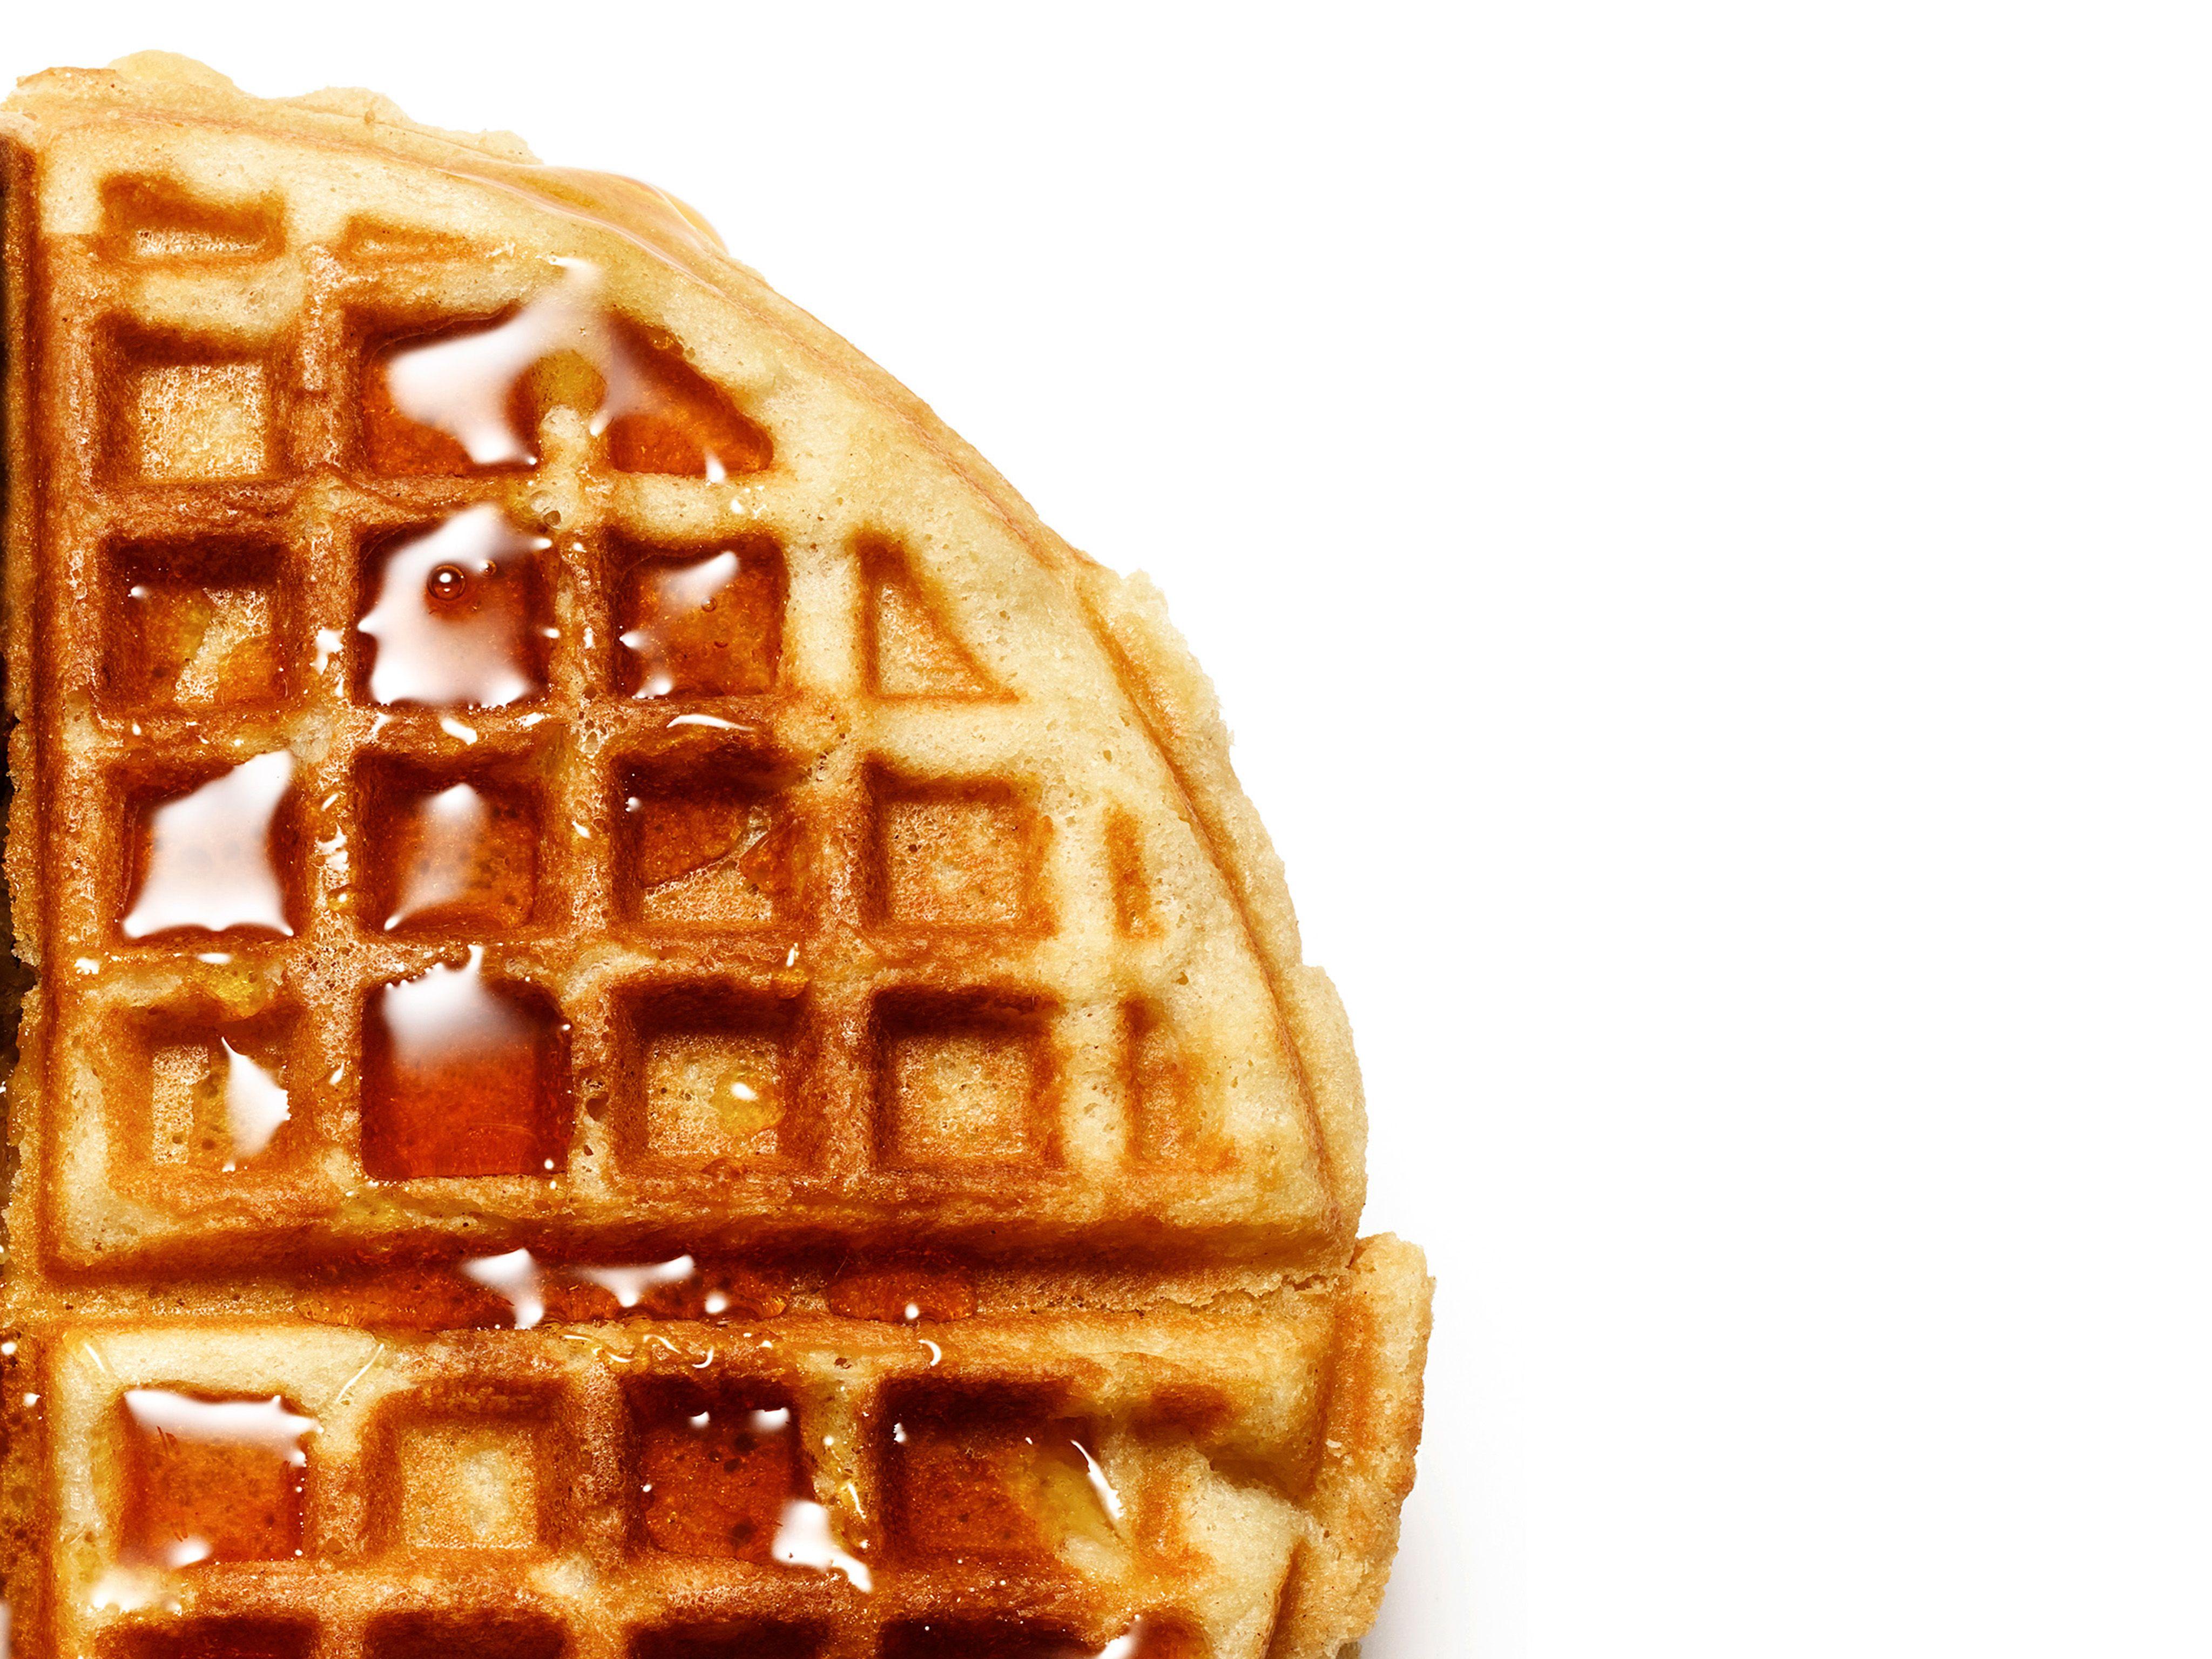 Sour Cream Waffles Recipe Food Network Recipes Waffle Recipes Food